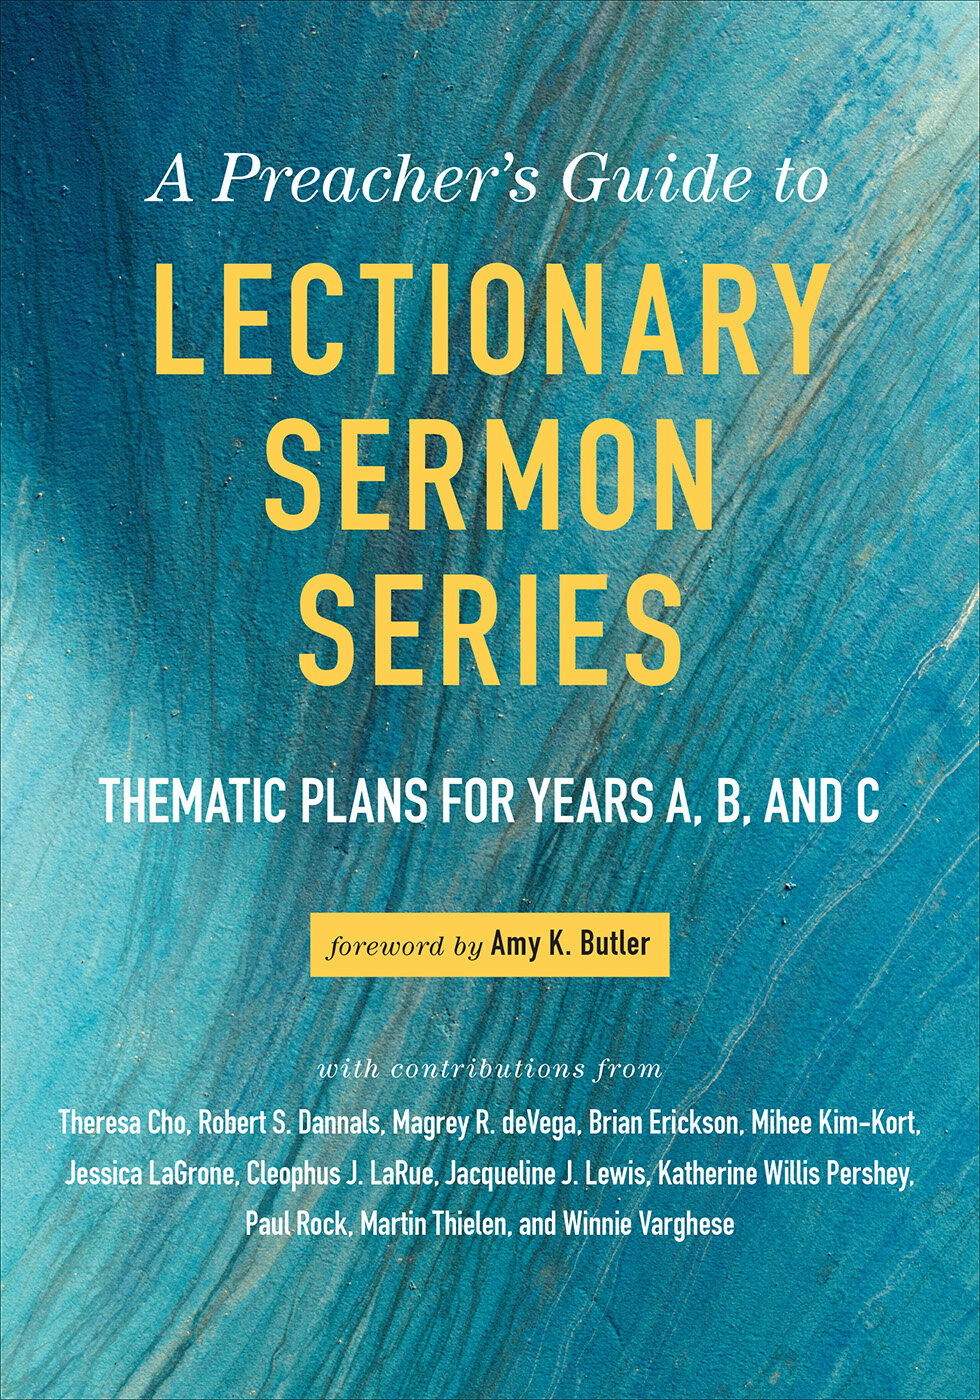 A Preacher's Guide to Lectionary Sermon Series